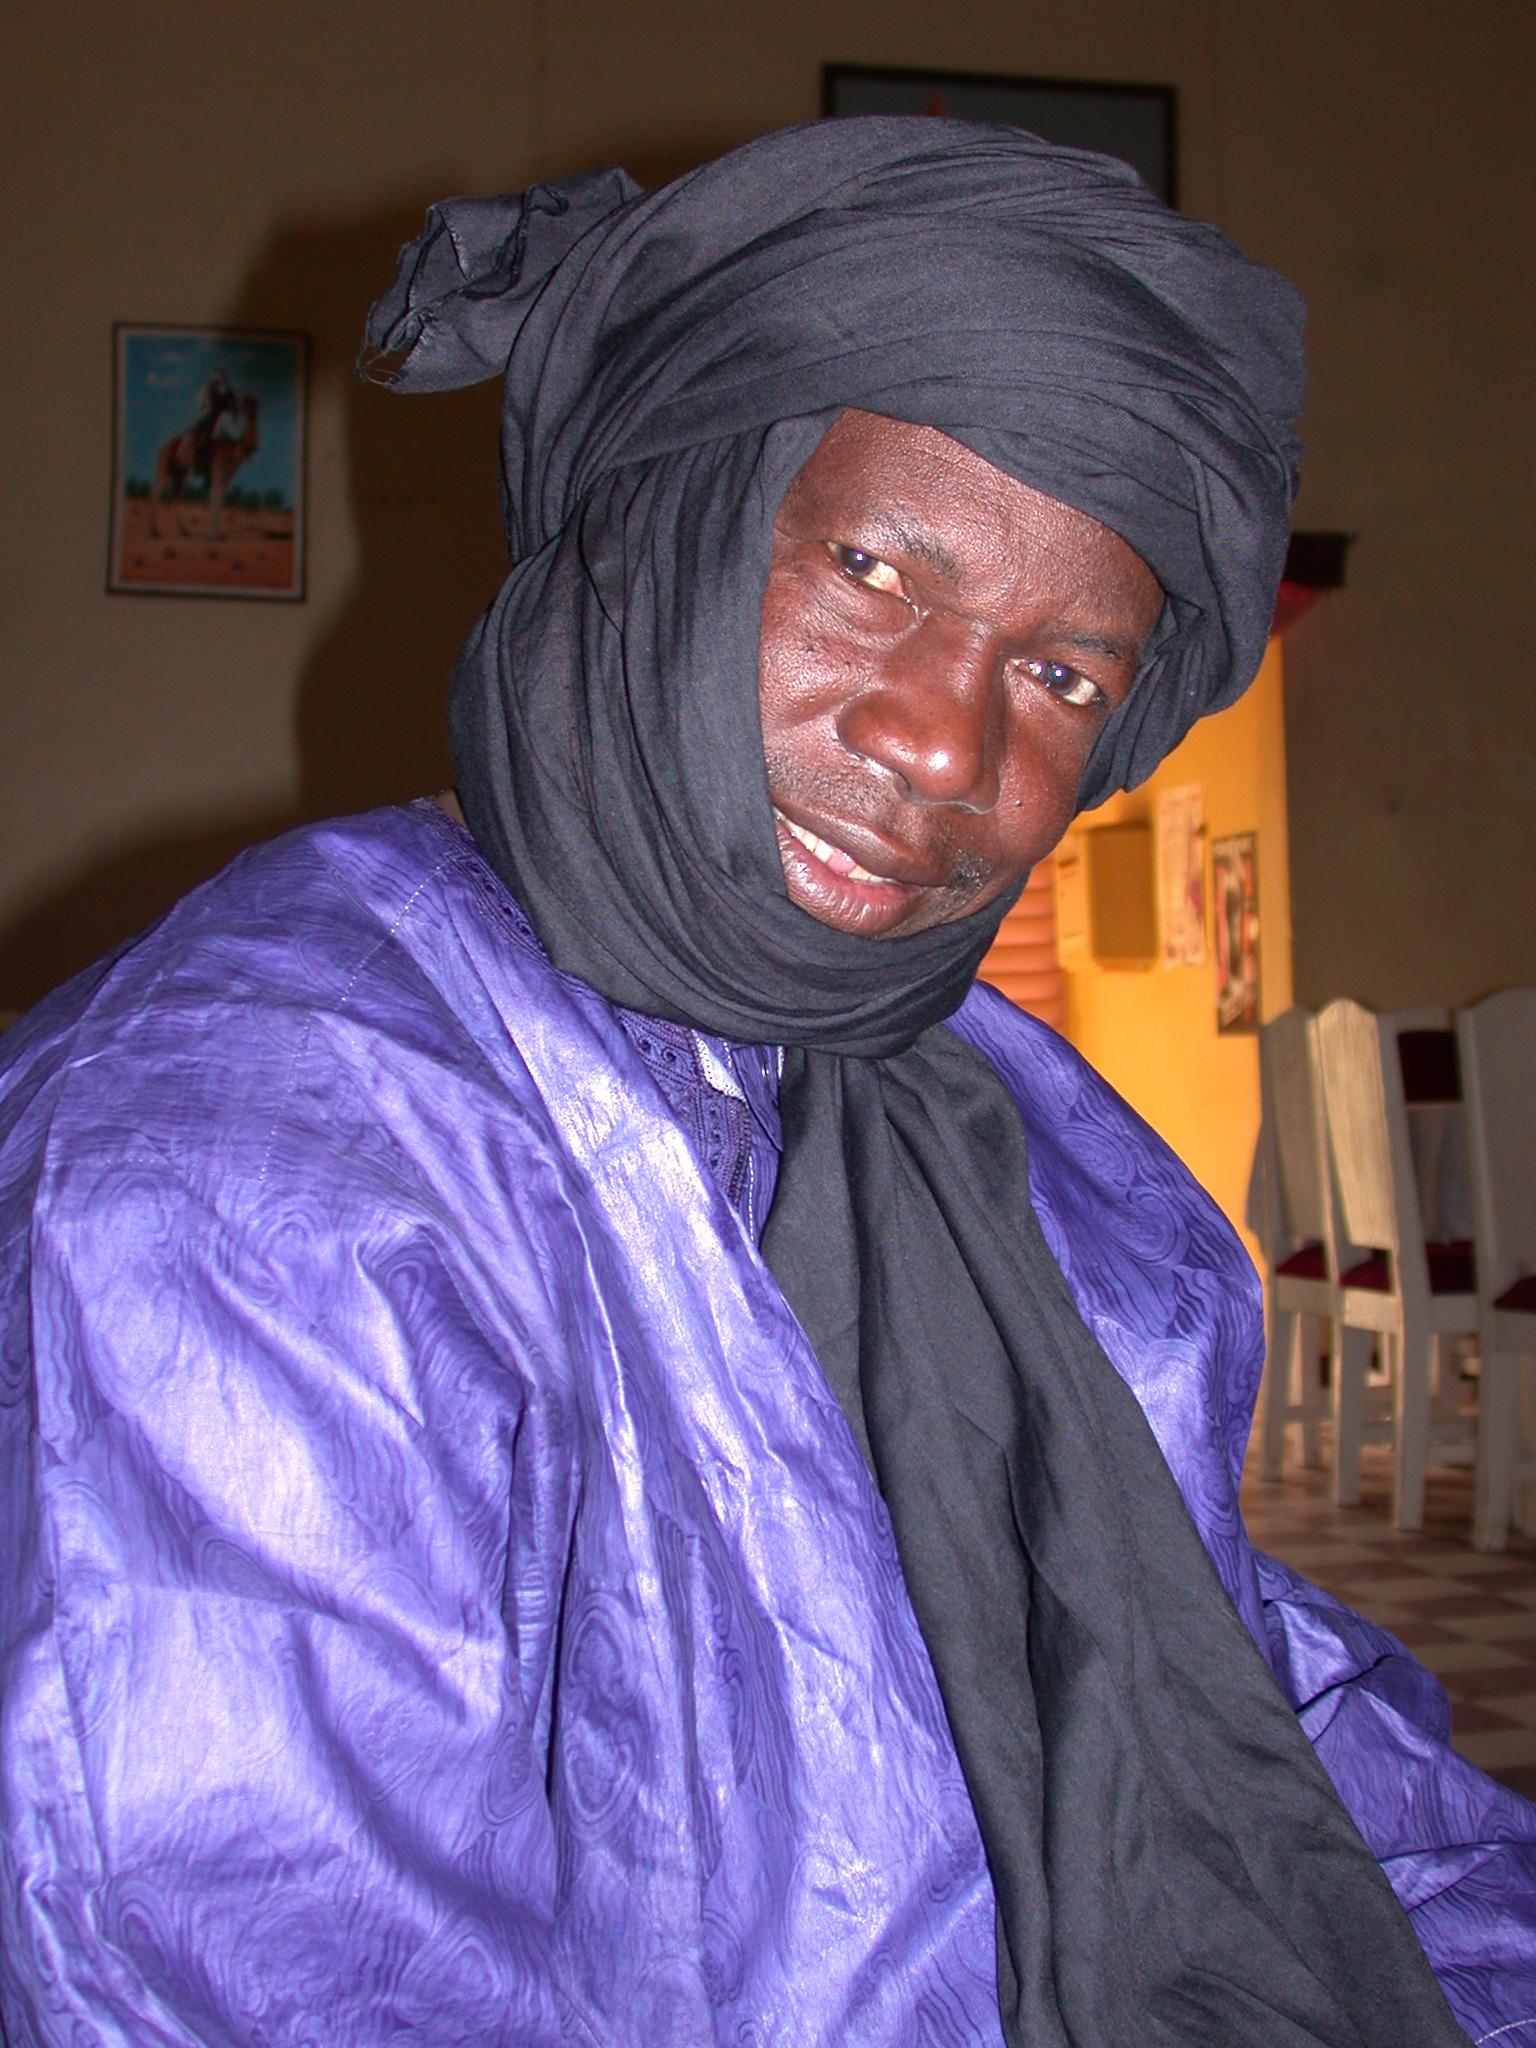 Boubakar Touré, Owner of Hotel Boctou, Timbuktu, Mali